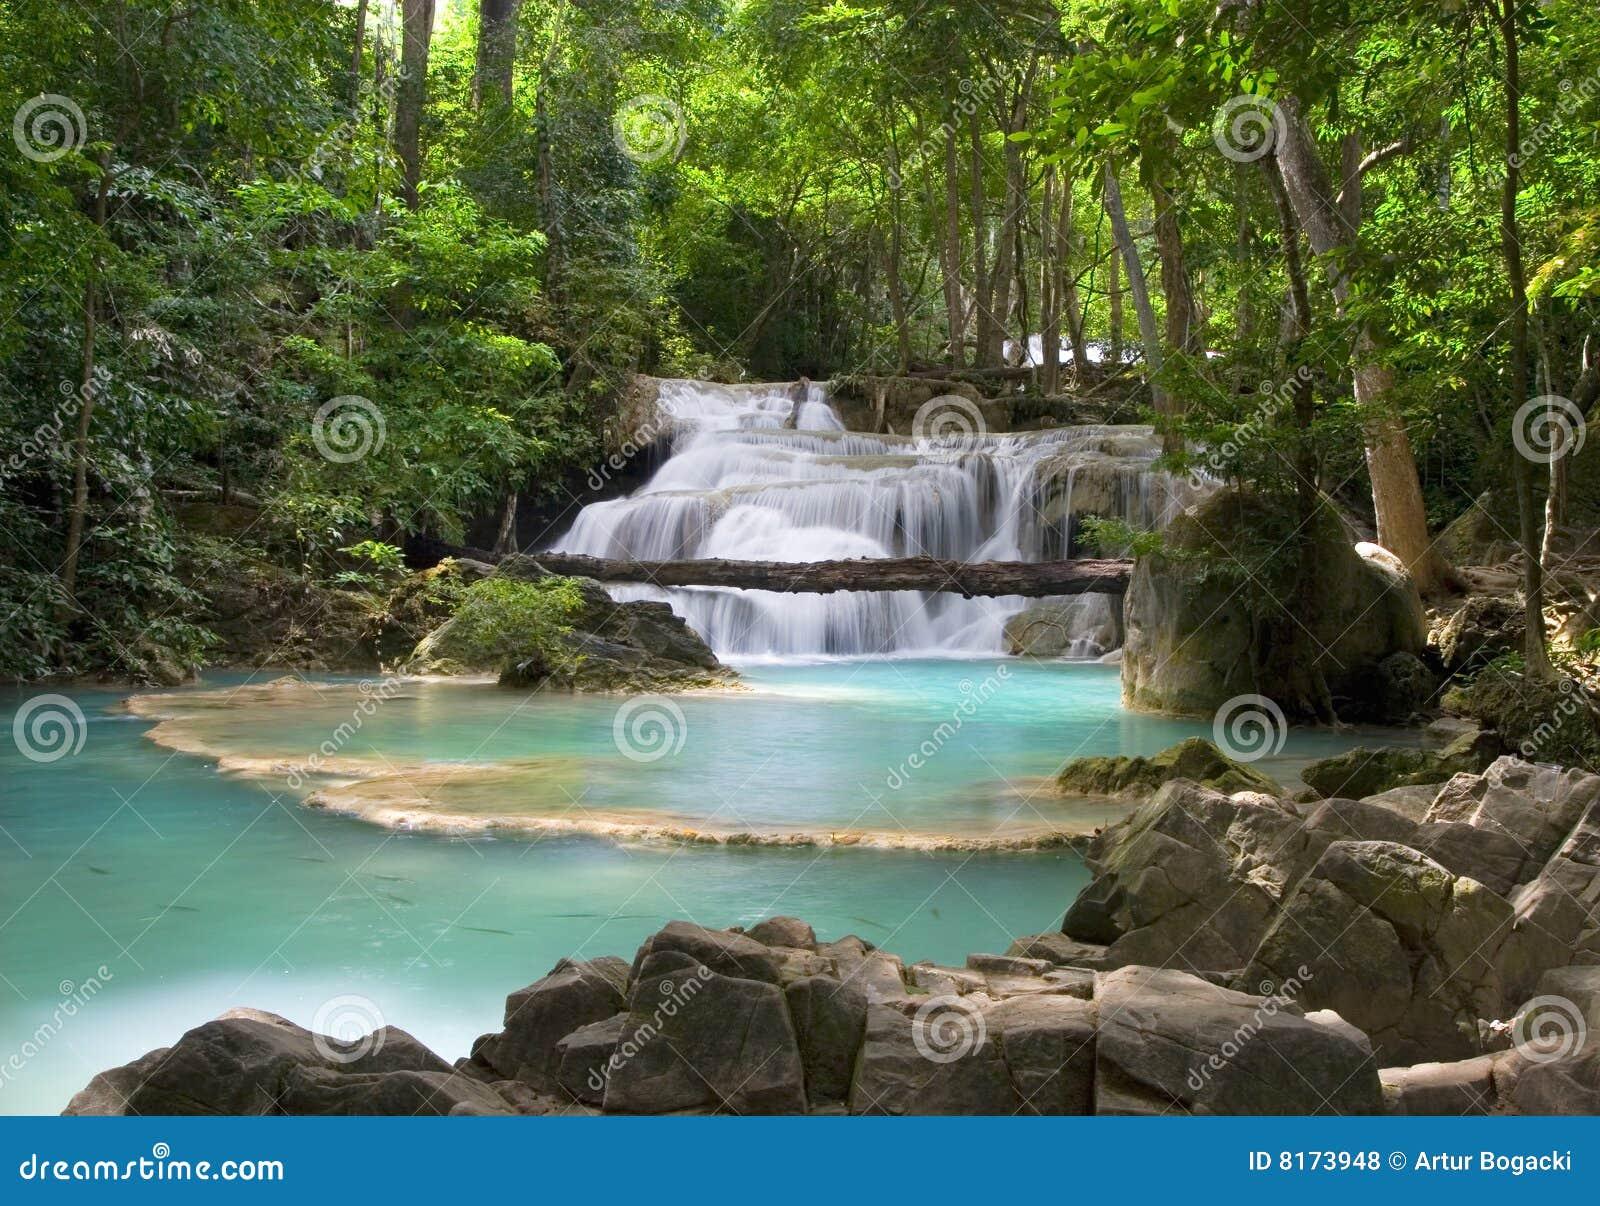 Dżungli sceneria